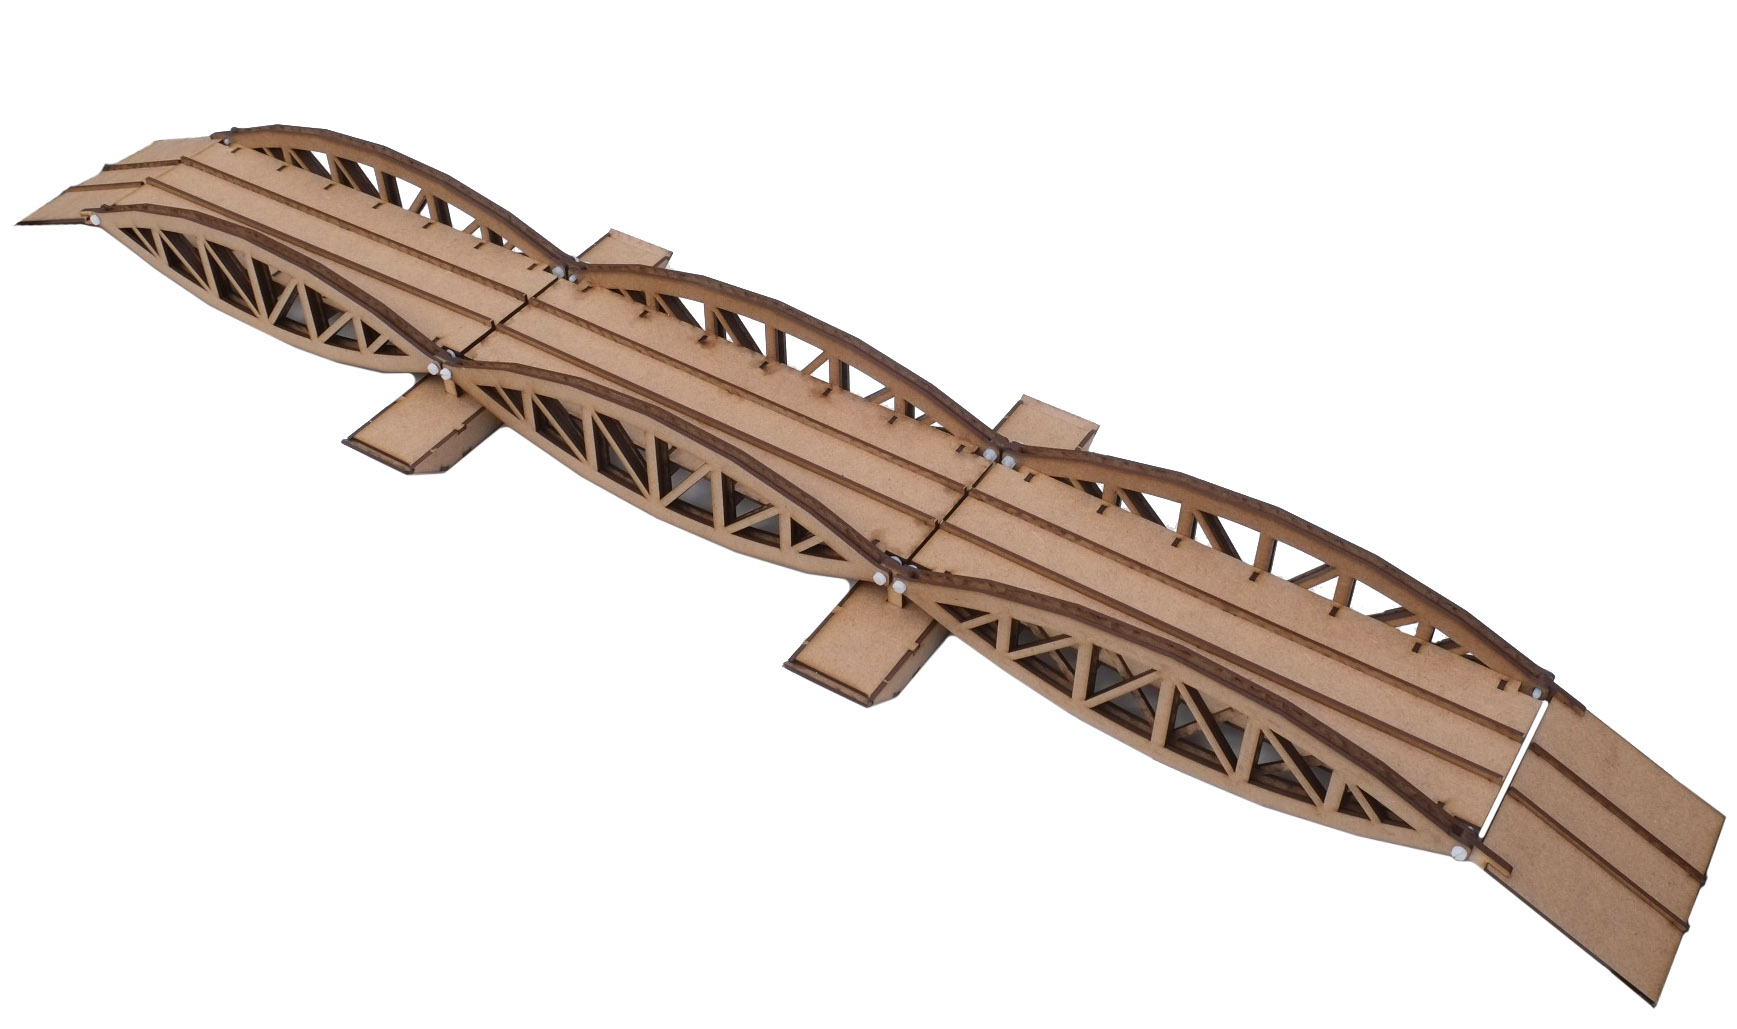 28mm Pontoon Bridge - 3 Section